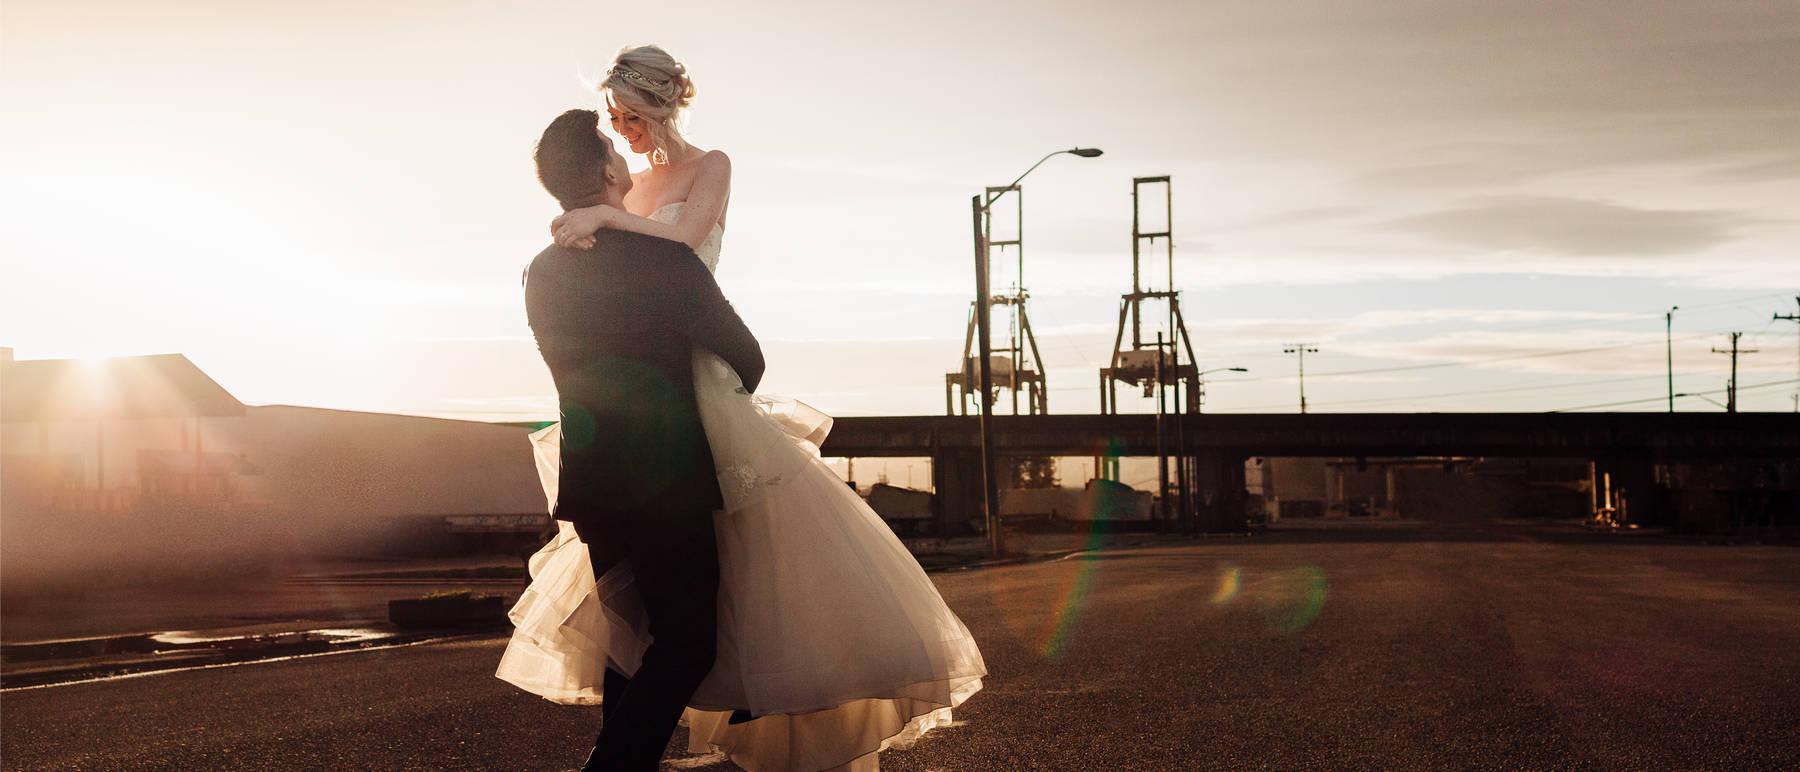 johnandjoseph-wedding-photographer-hz-slider-365